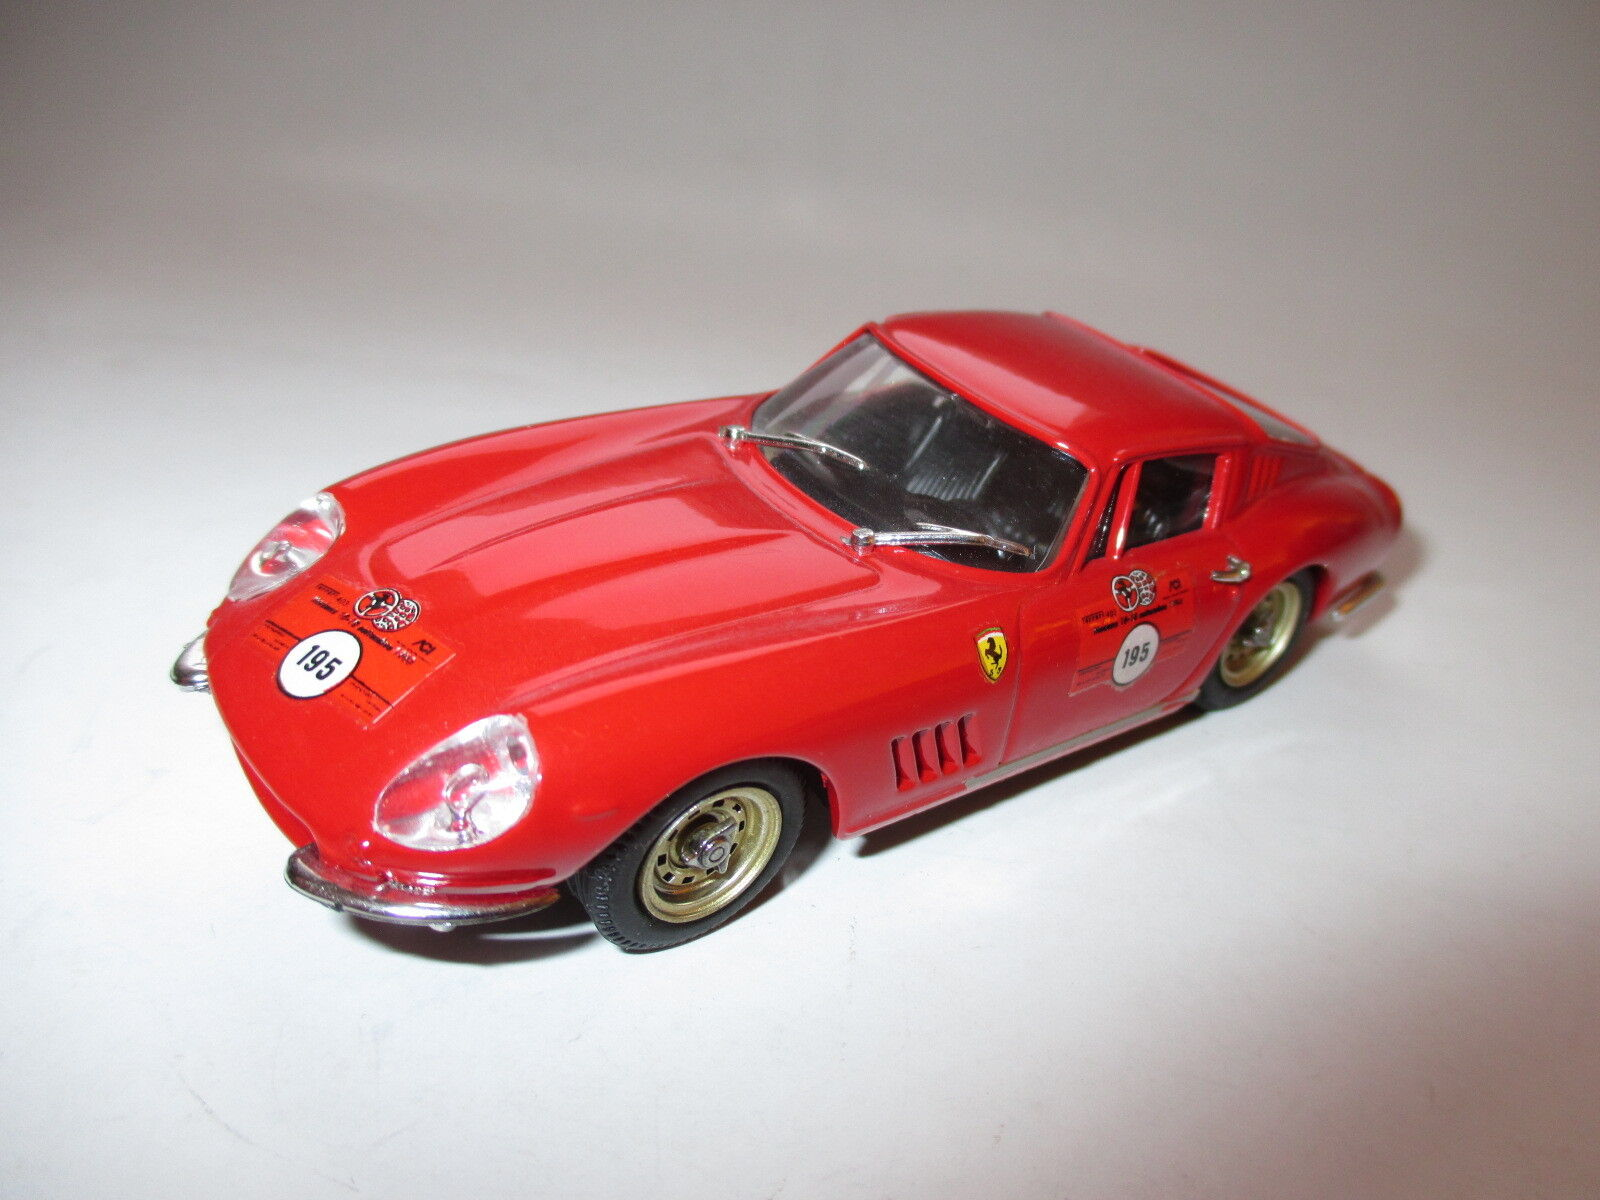 Rennwagen racing car Ferrari 275 GTB 4 Rally Rallye Best in 1 43